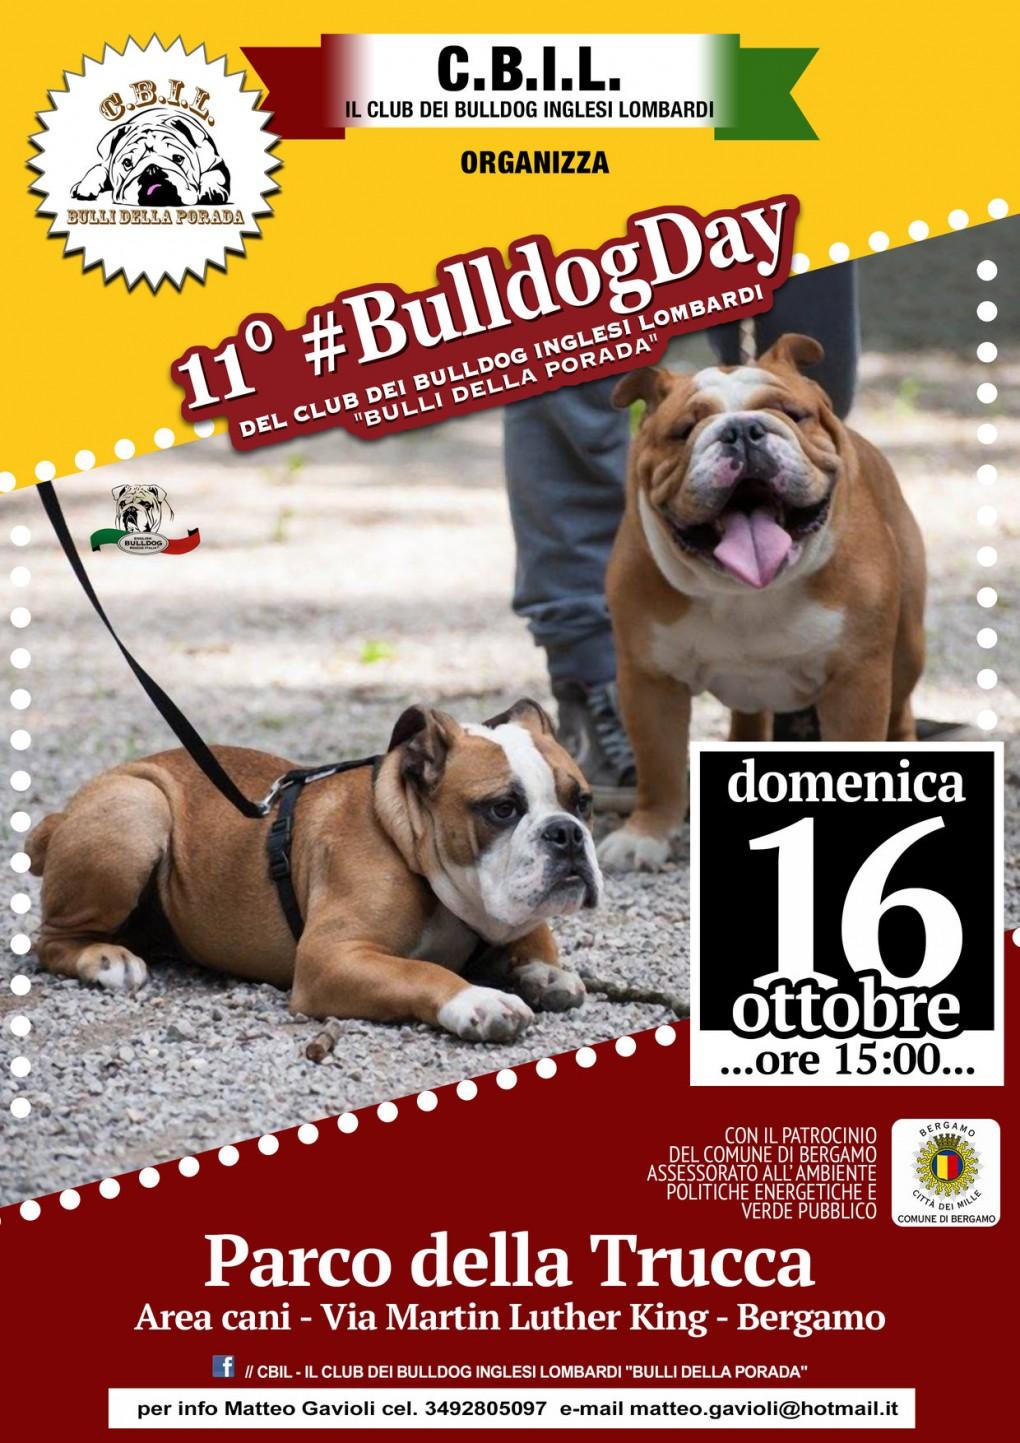 Locandina 11° _BulldogDay a Bergamo - Copia (2)